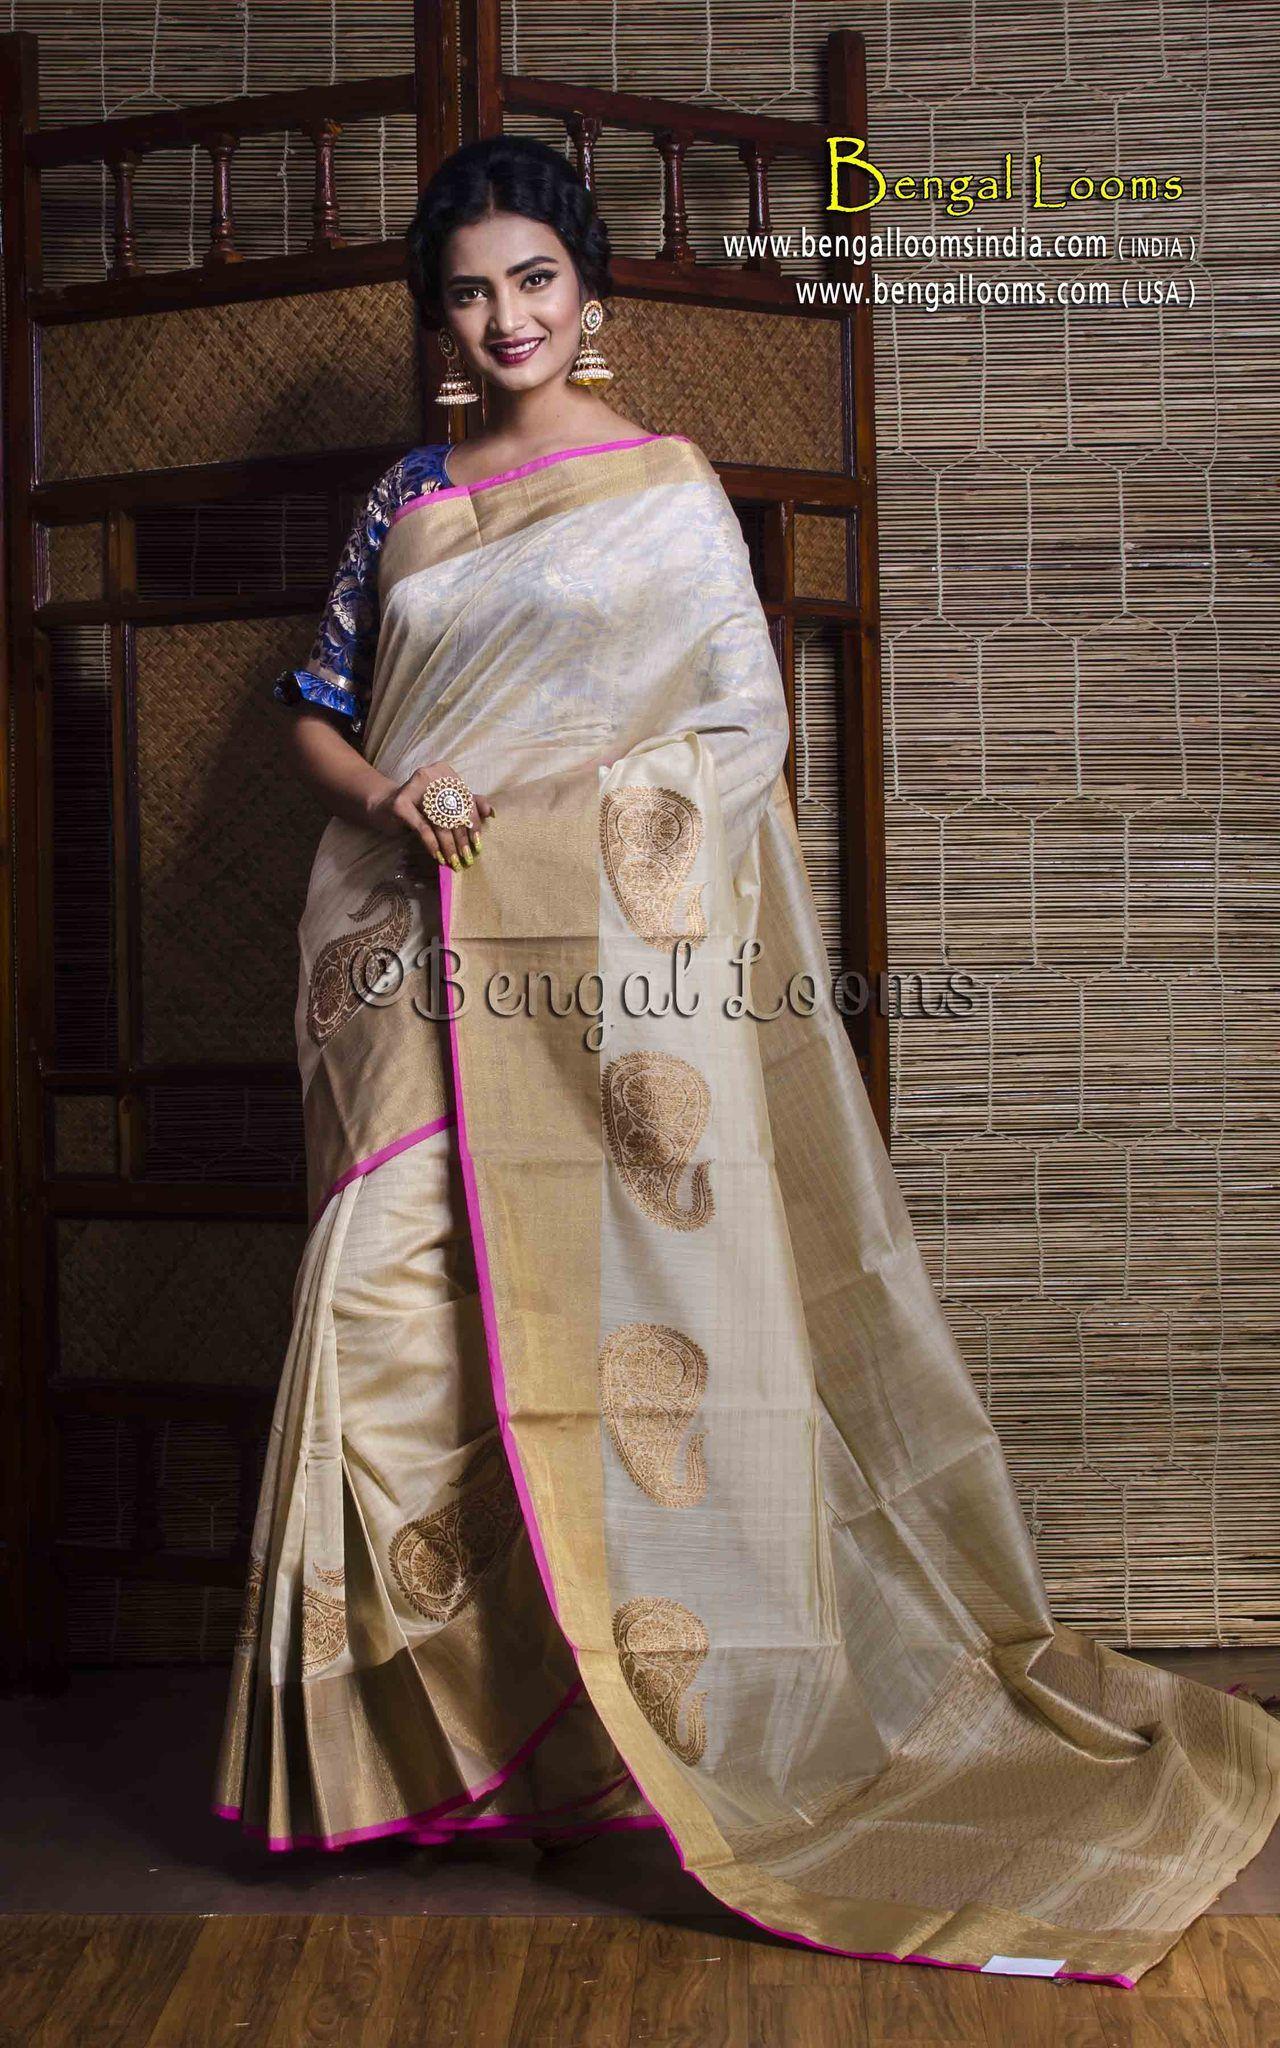 ca71e28b36d967 Chanderi Cotton Silk Banarasi Saree in Off White and Gold